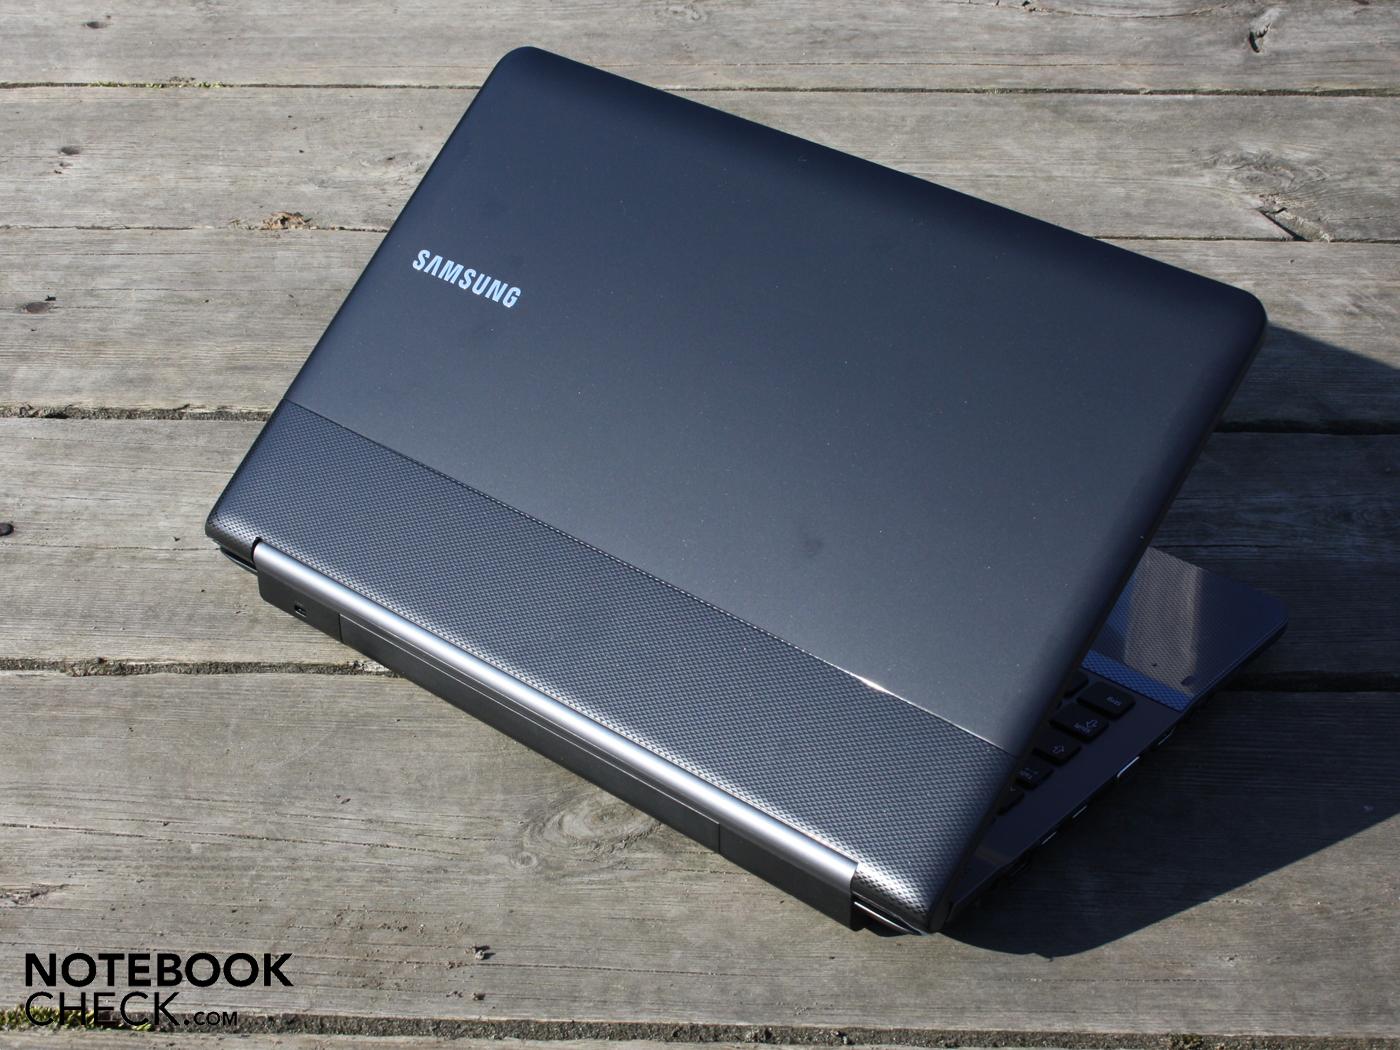 Notebook samsung lançamento 2013 - Bending Lid